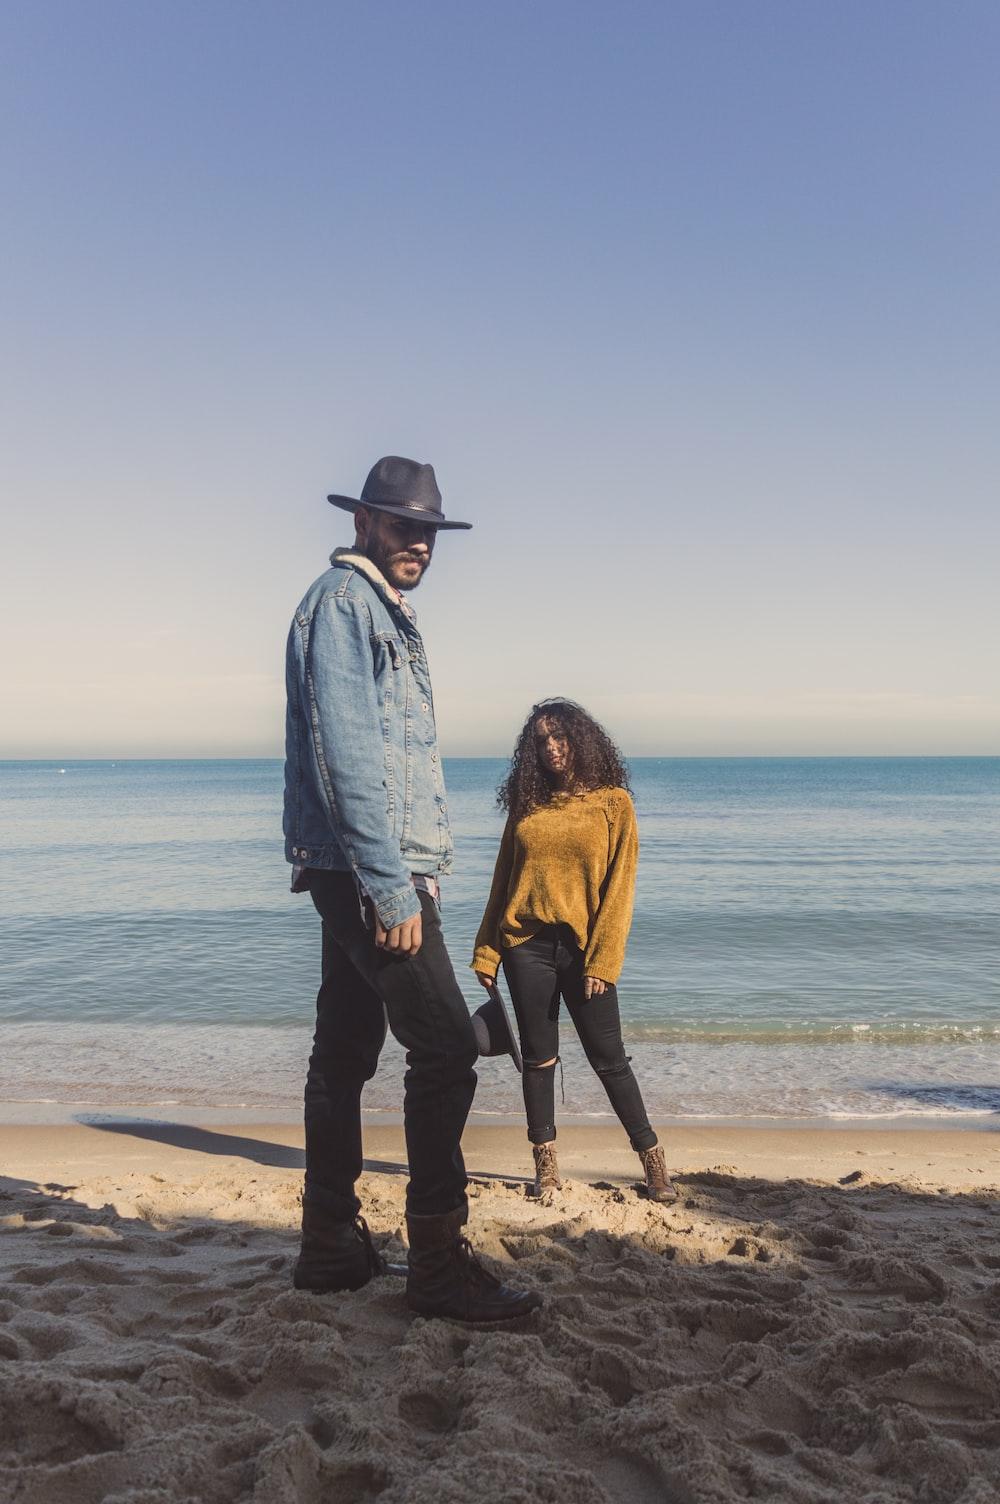 man standing on seashore near woman